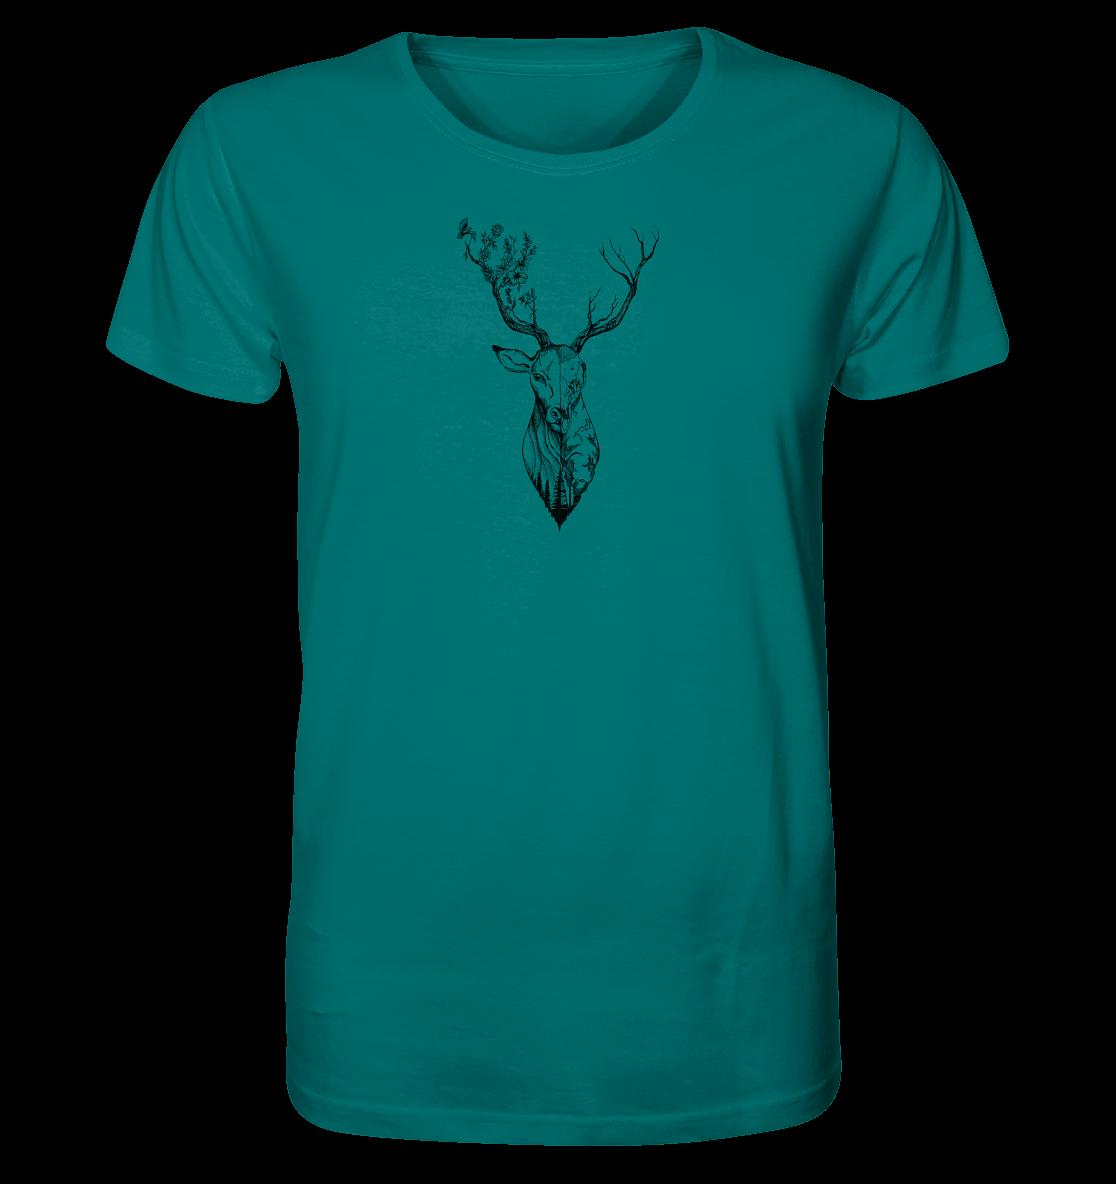 front-organic-shirt-007373-1116x-14.png